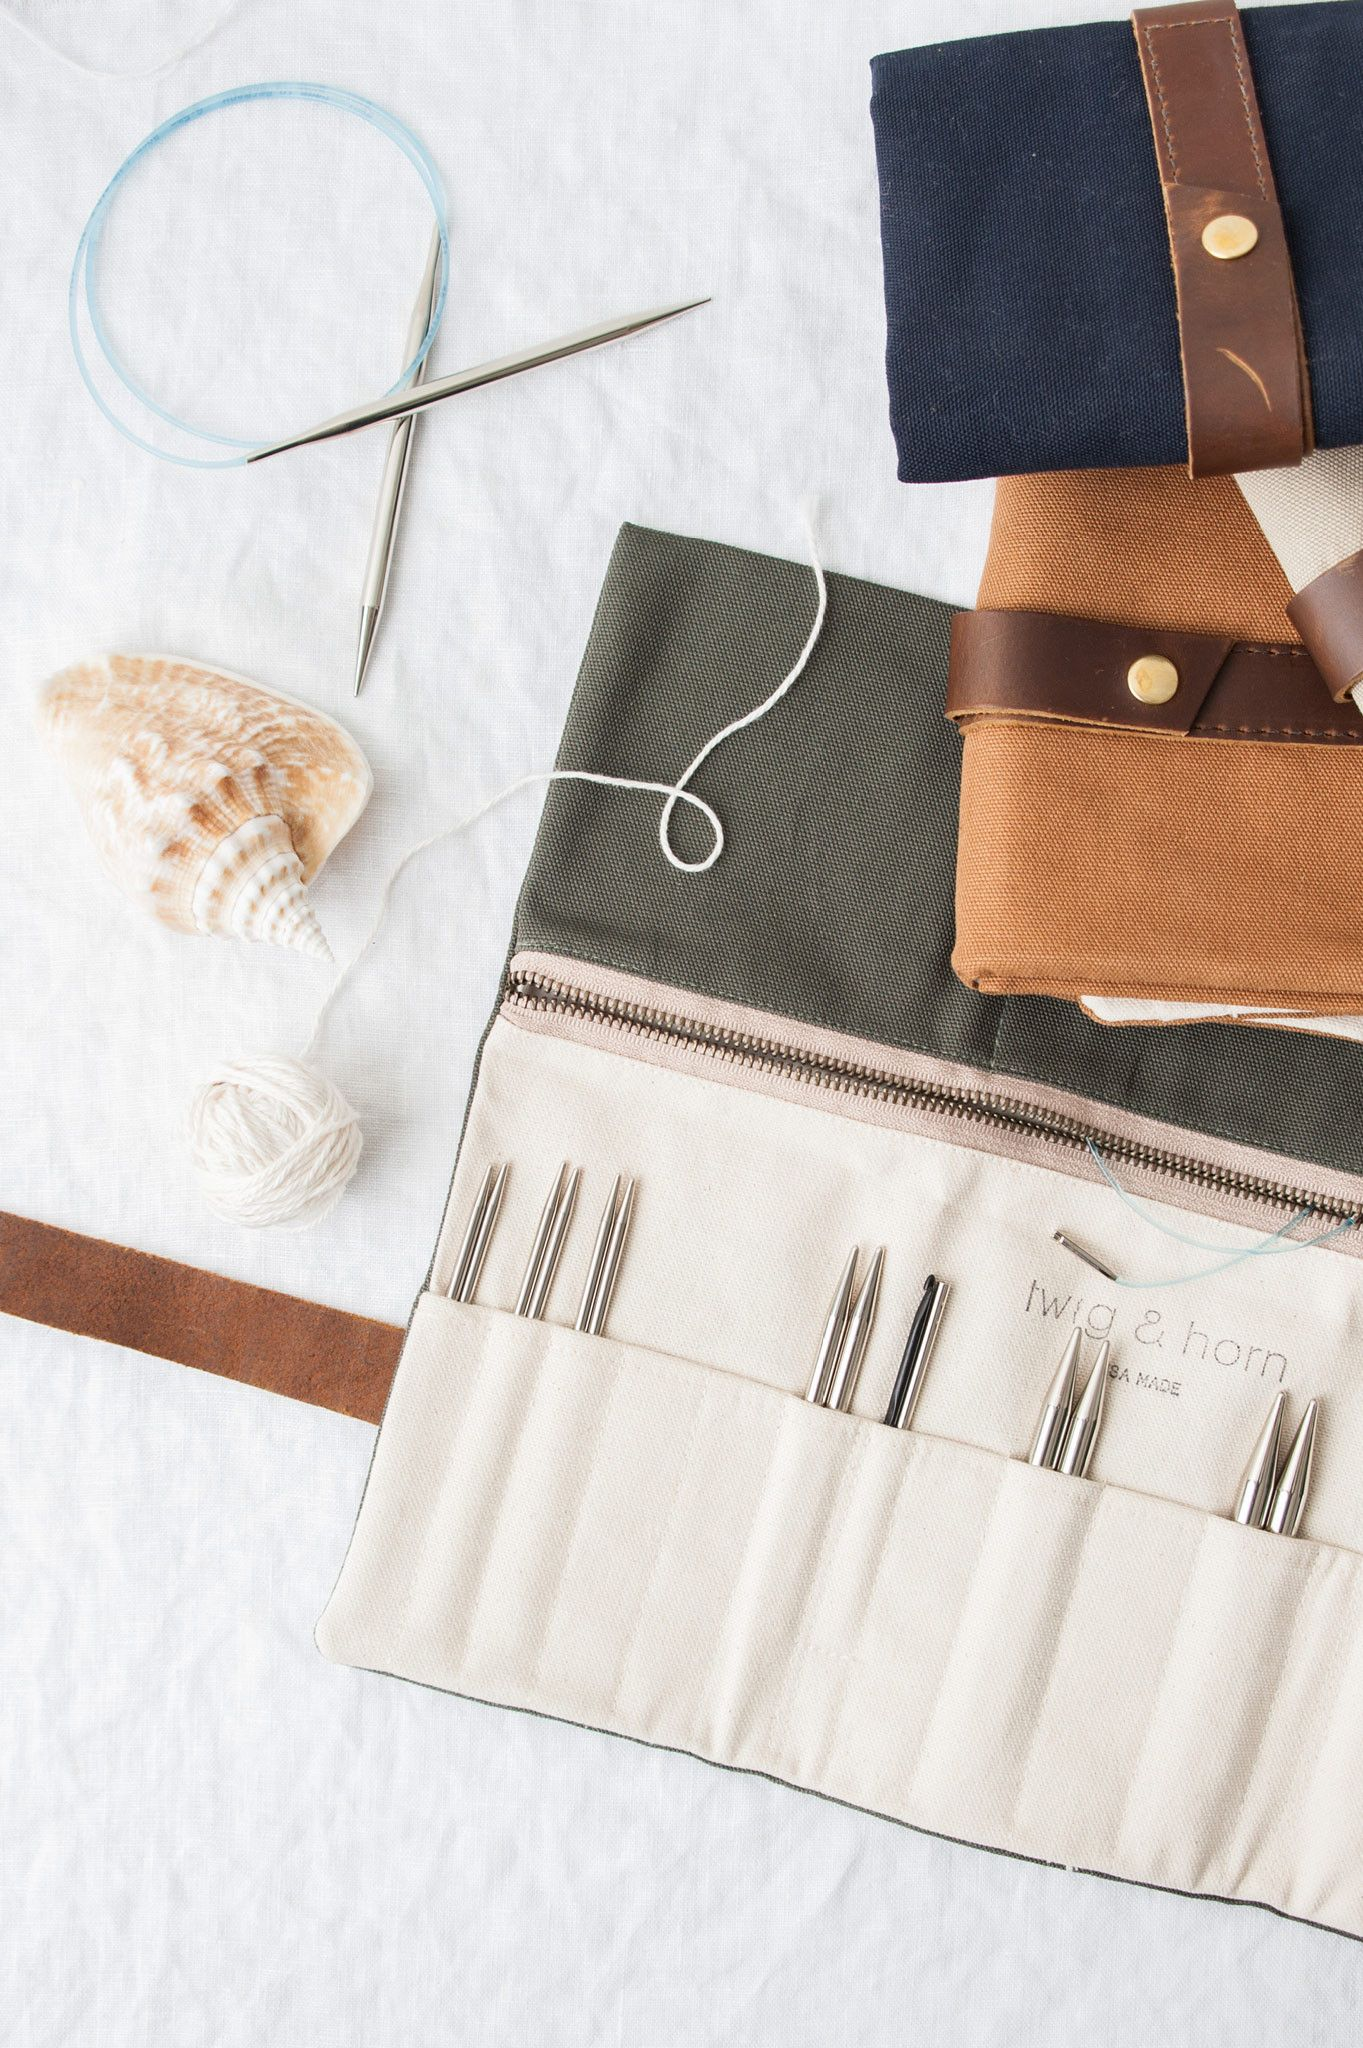 canvas interchangeable needle case | Needle case, Knitting ...